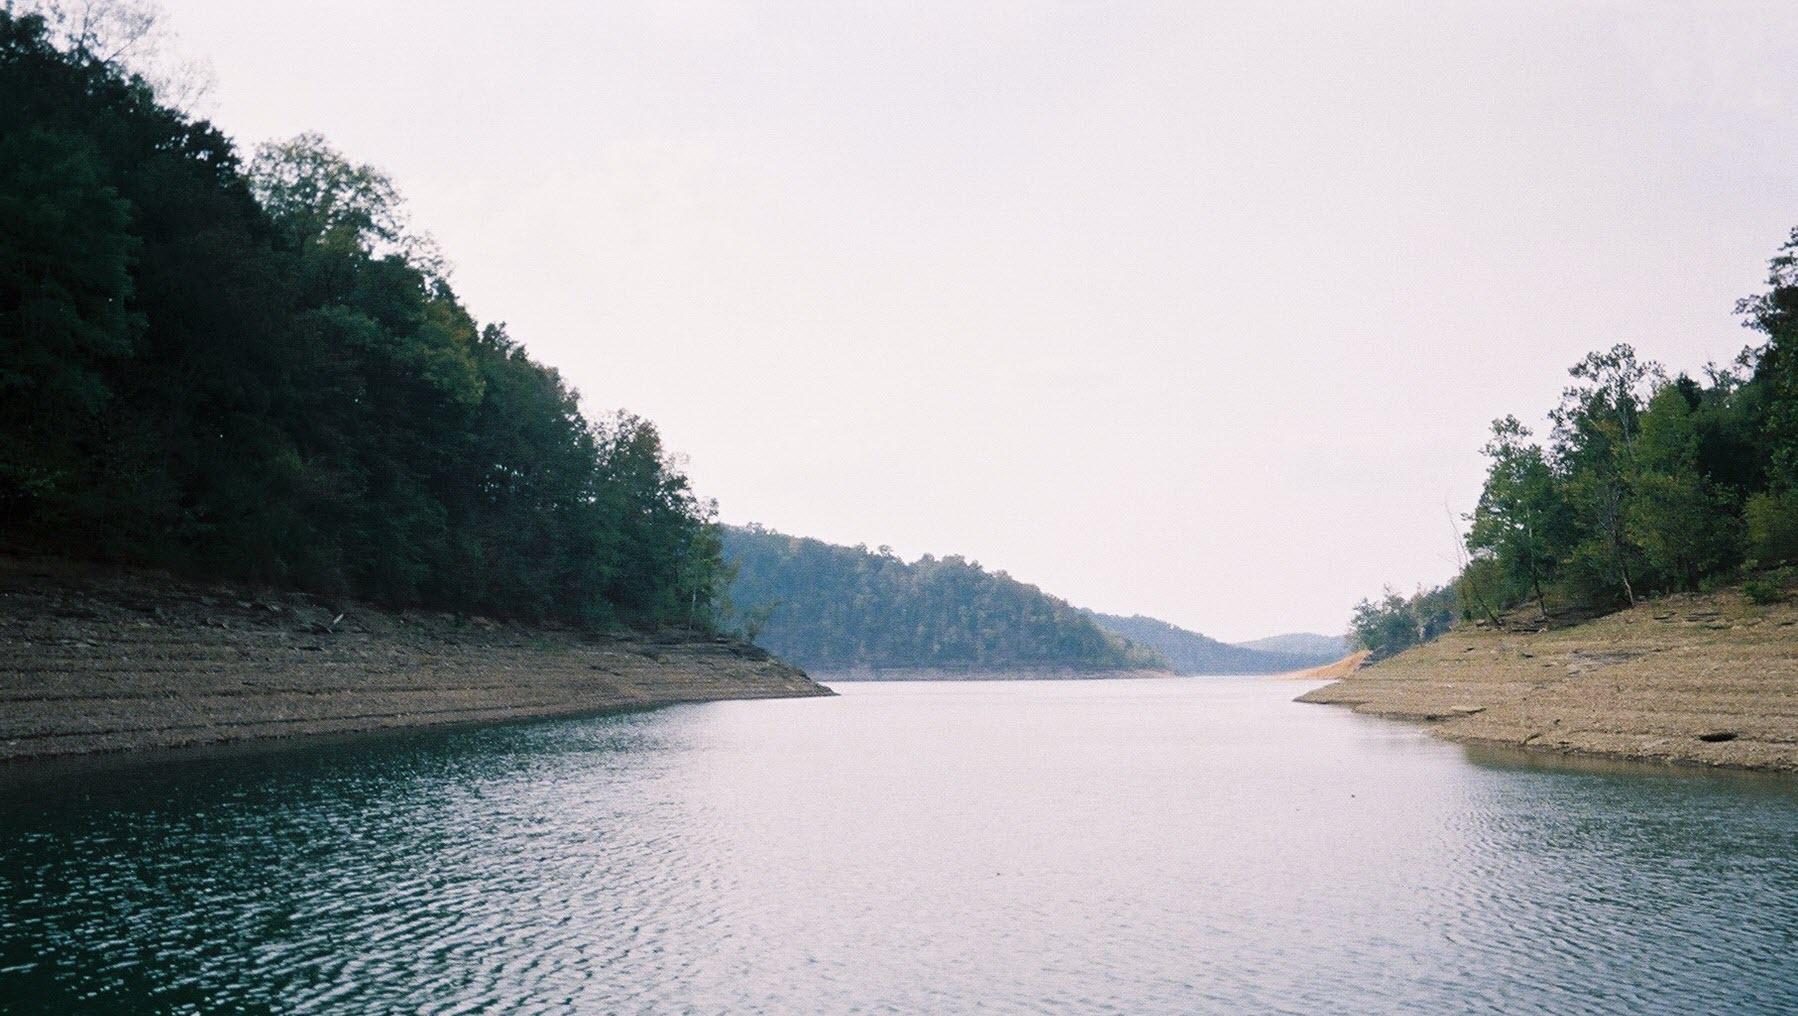 Lake_cumberland_tennessee